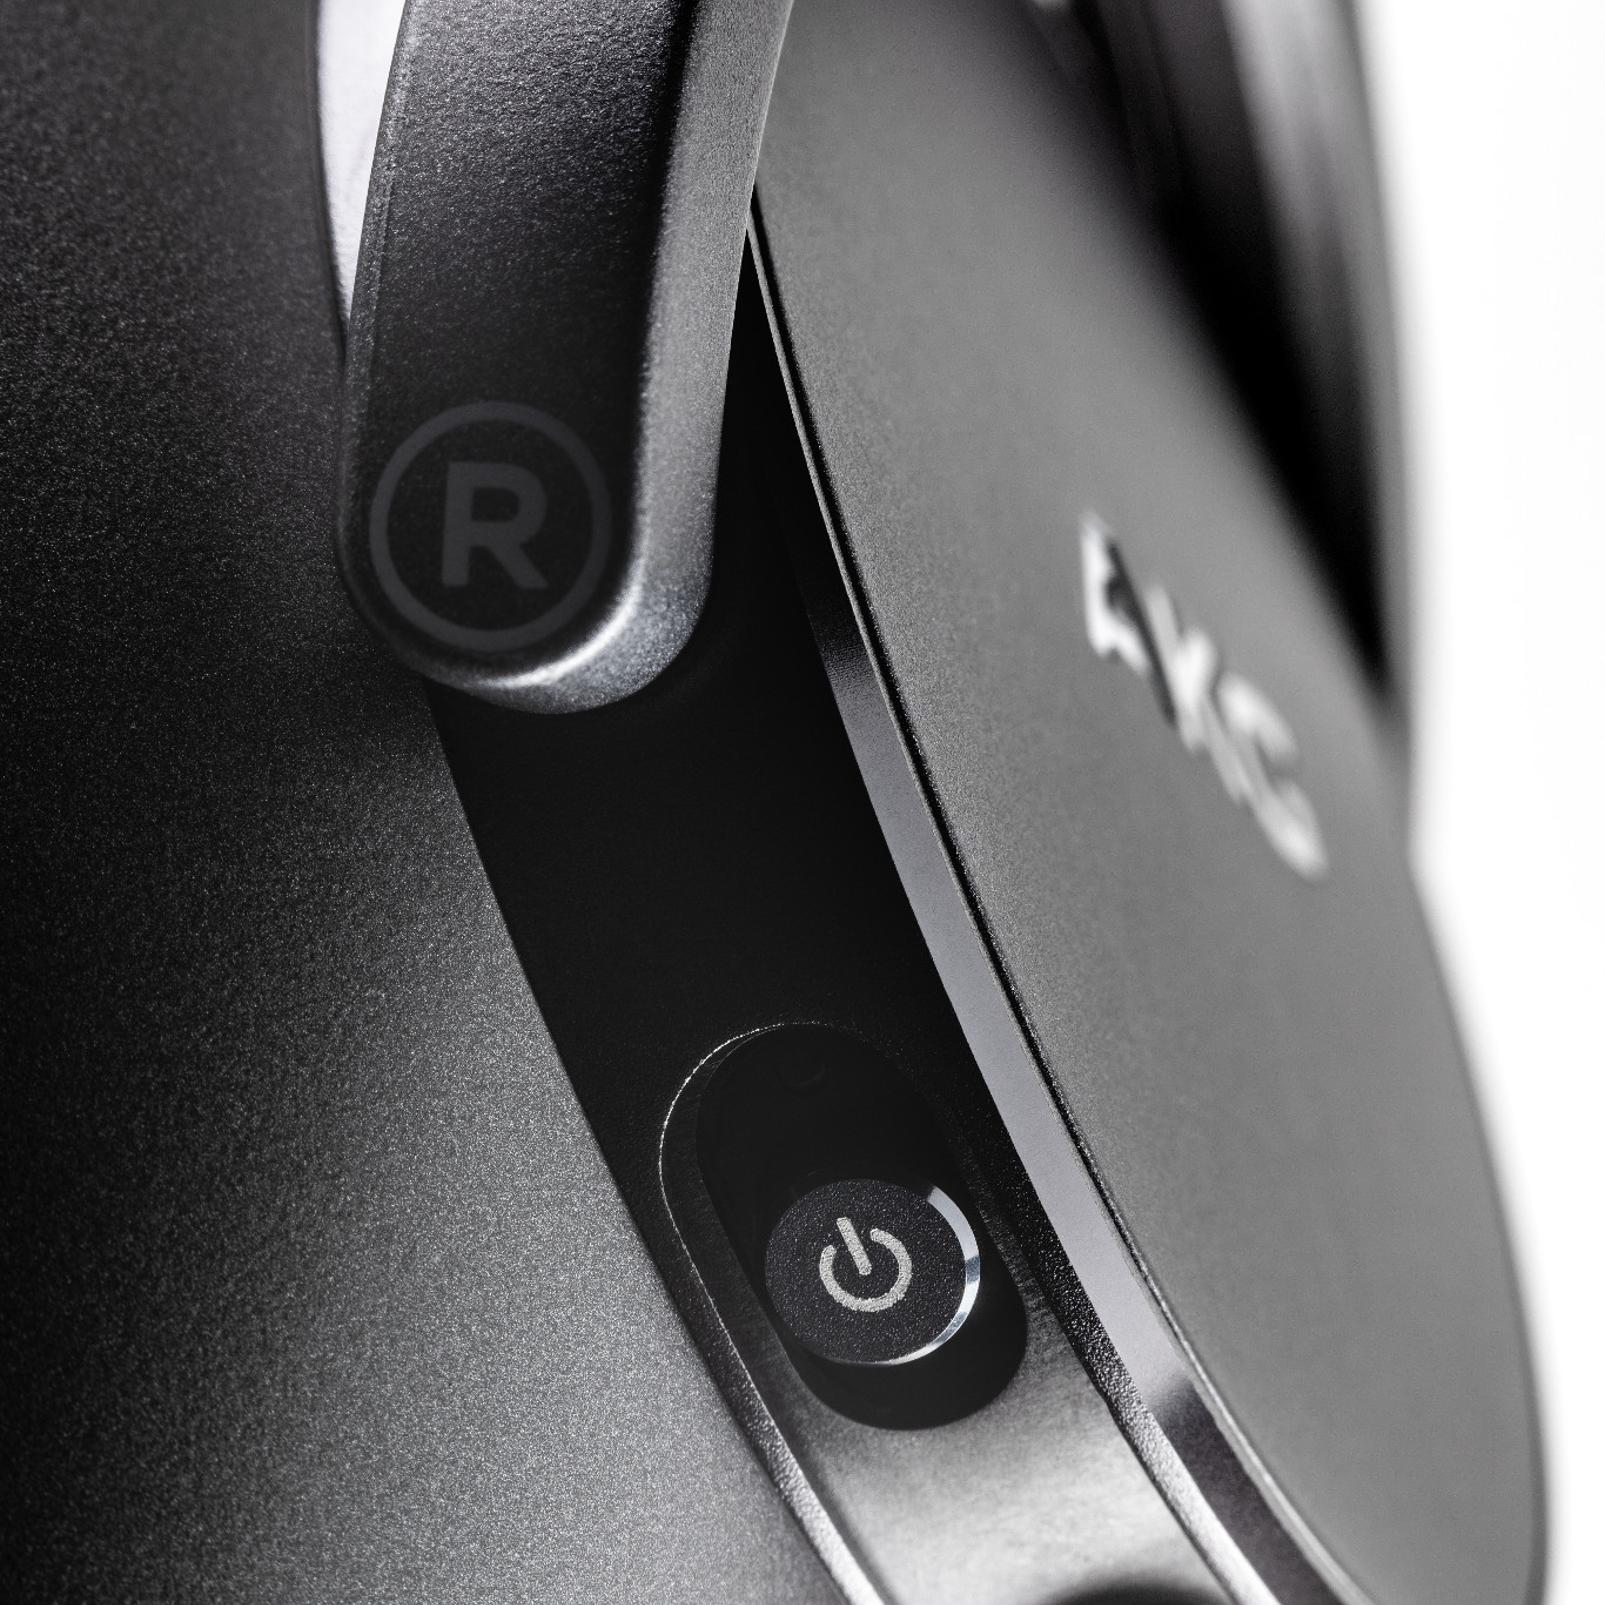 AKG N700NCM2 WIRELESS - Black - Wireless, Adaptive Noise Cancelling Headphones - Detailshot 2